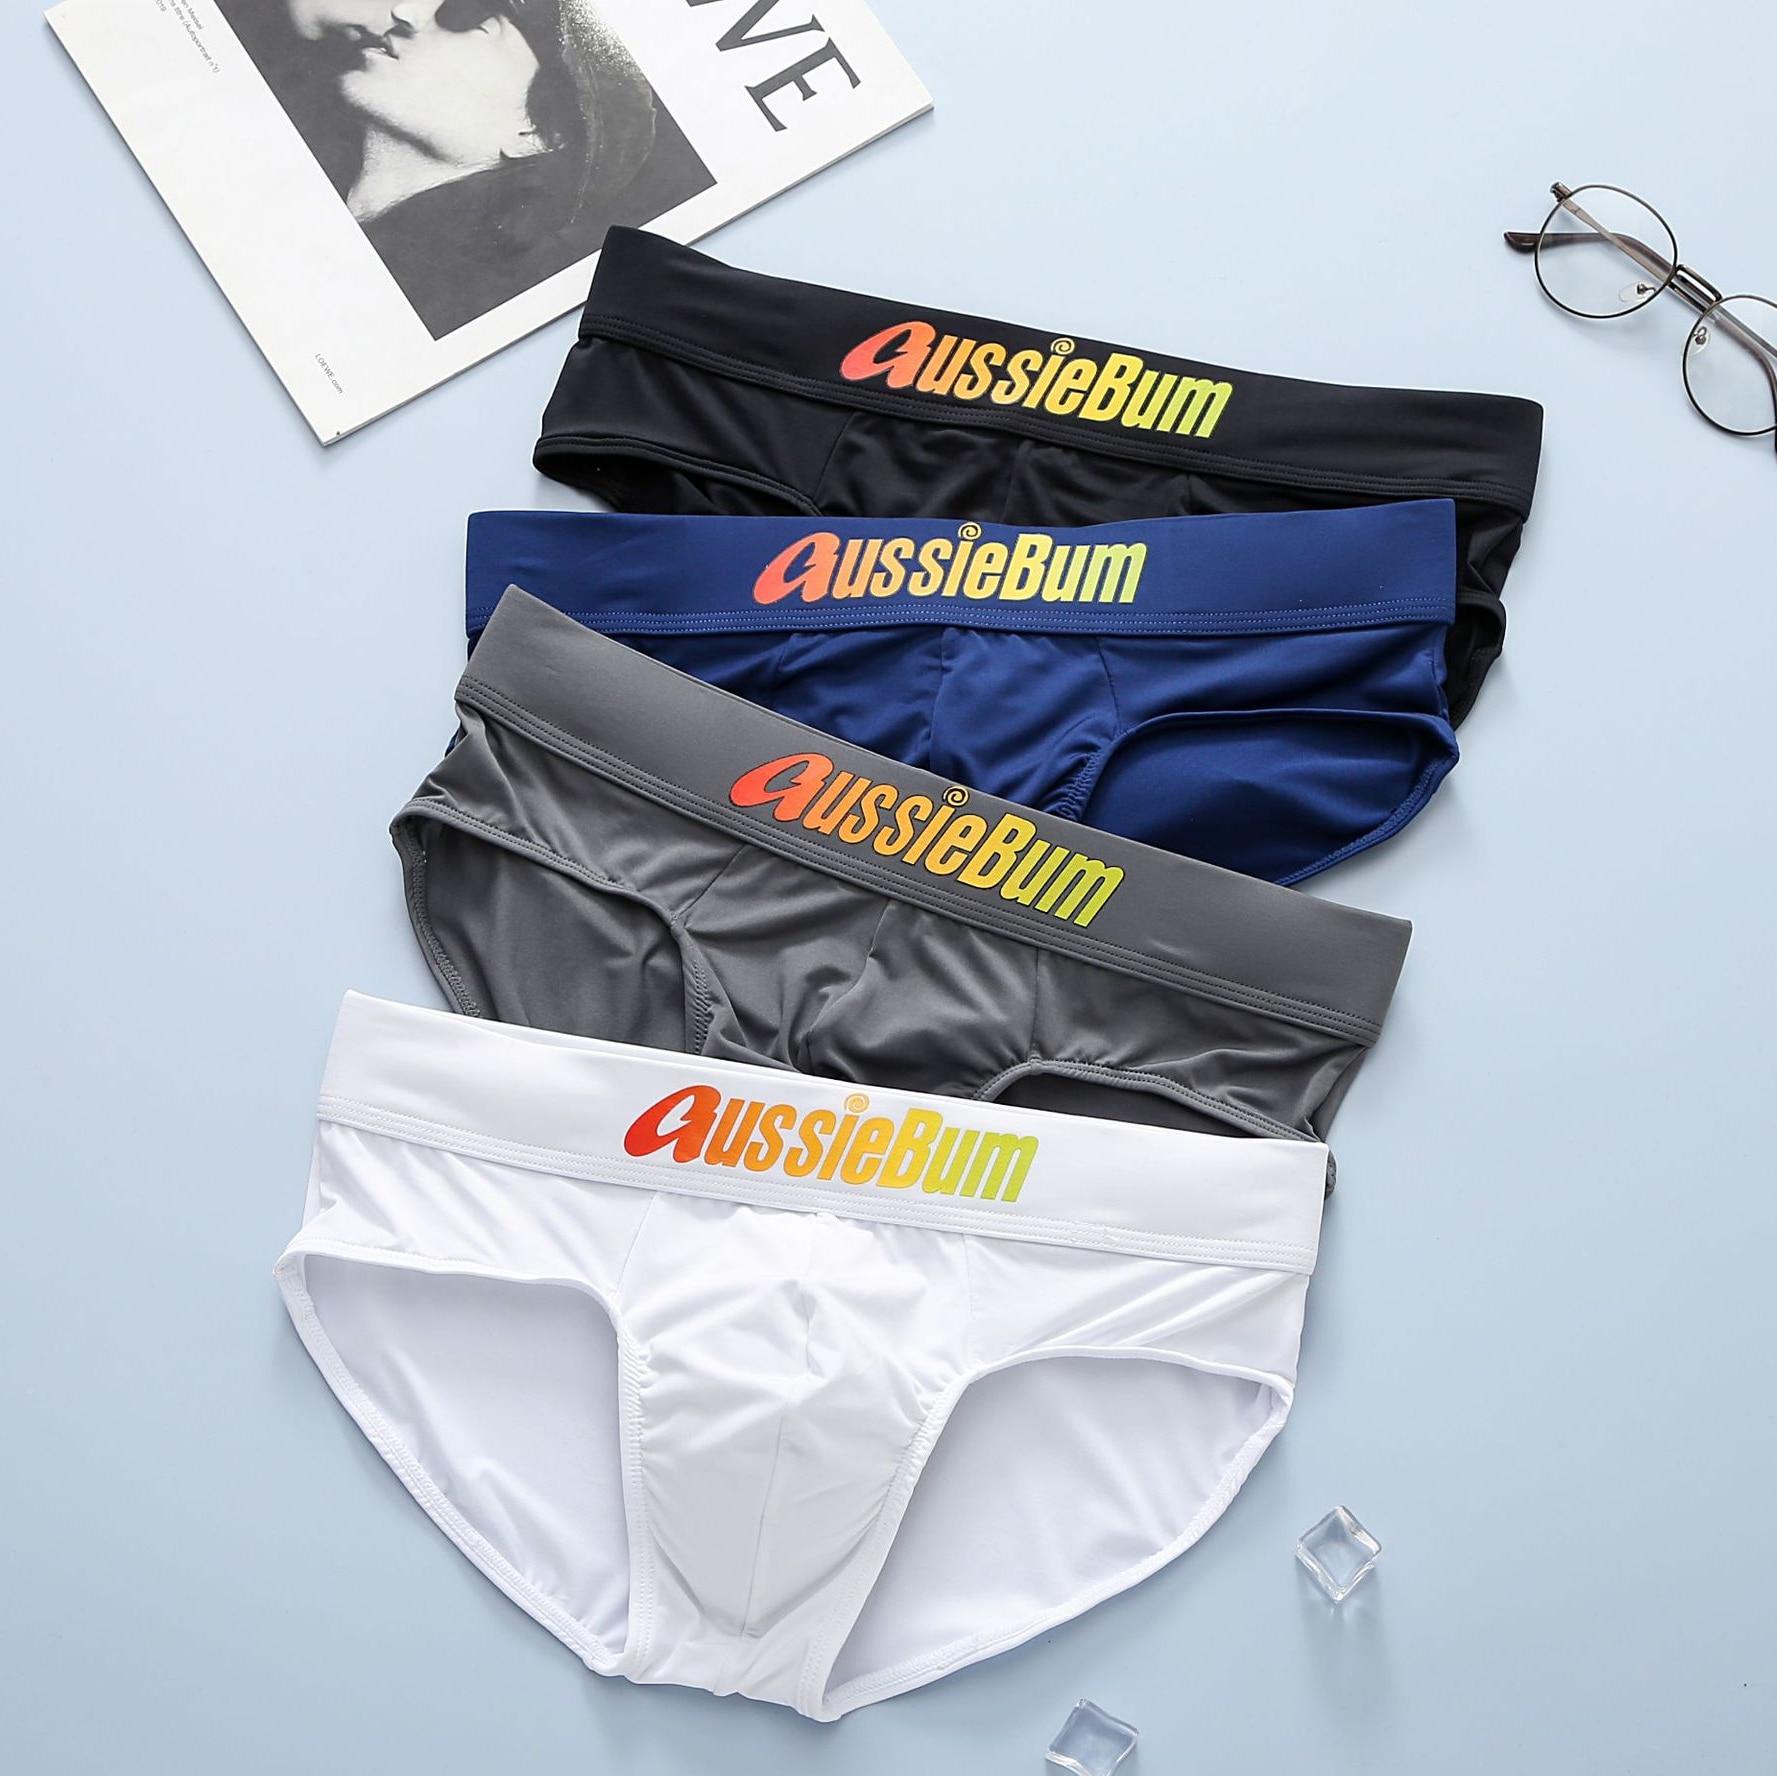 Aussiebum men's briefs milk silk low waist elastic comfortable u convex bag colorful words 1